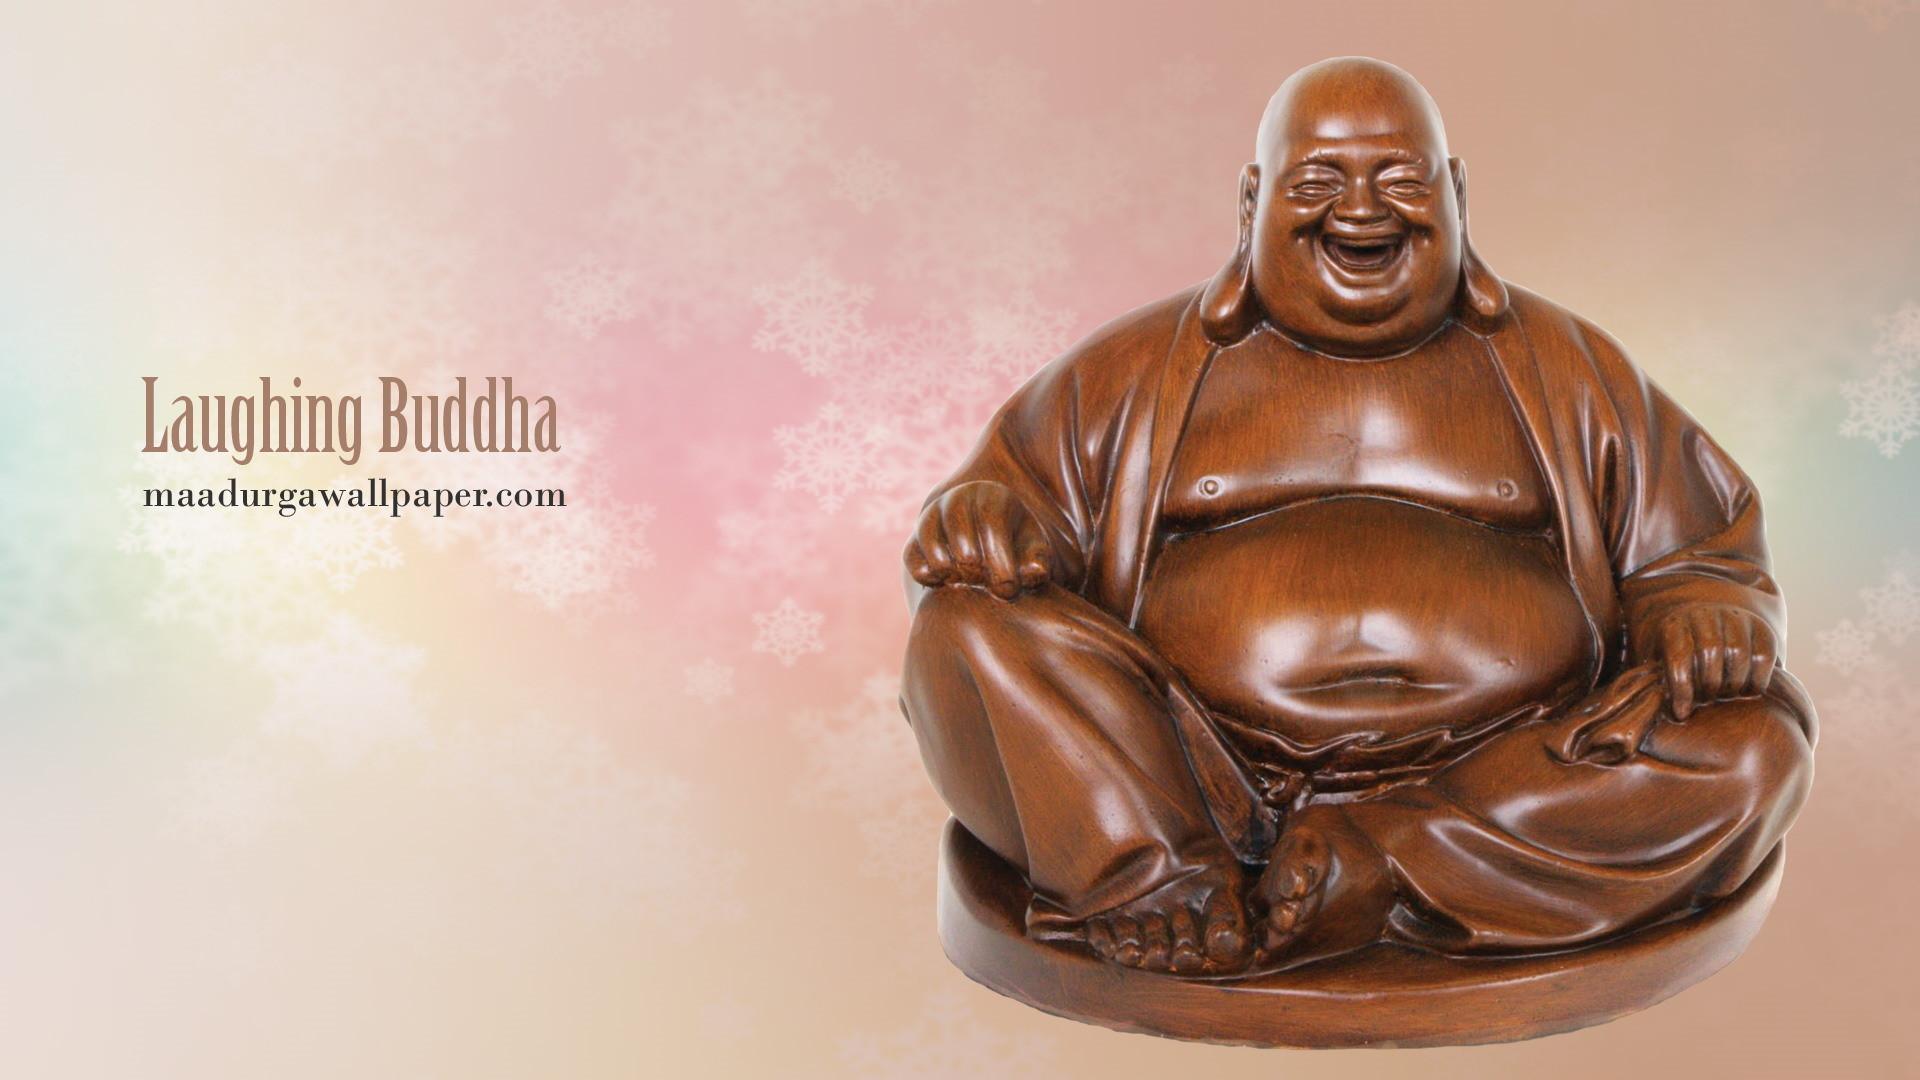 Laughing Buddha photo